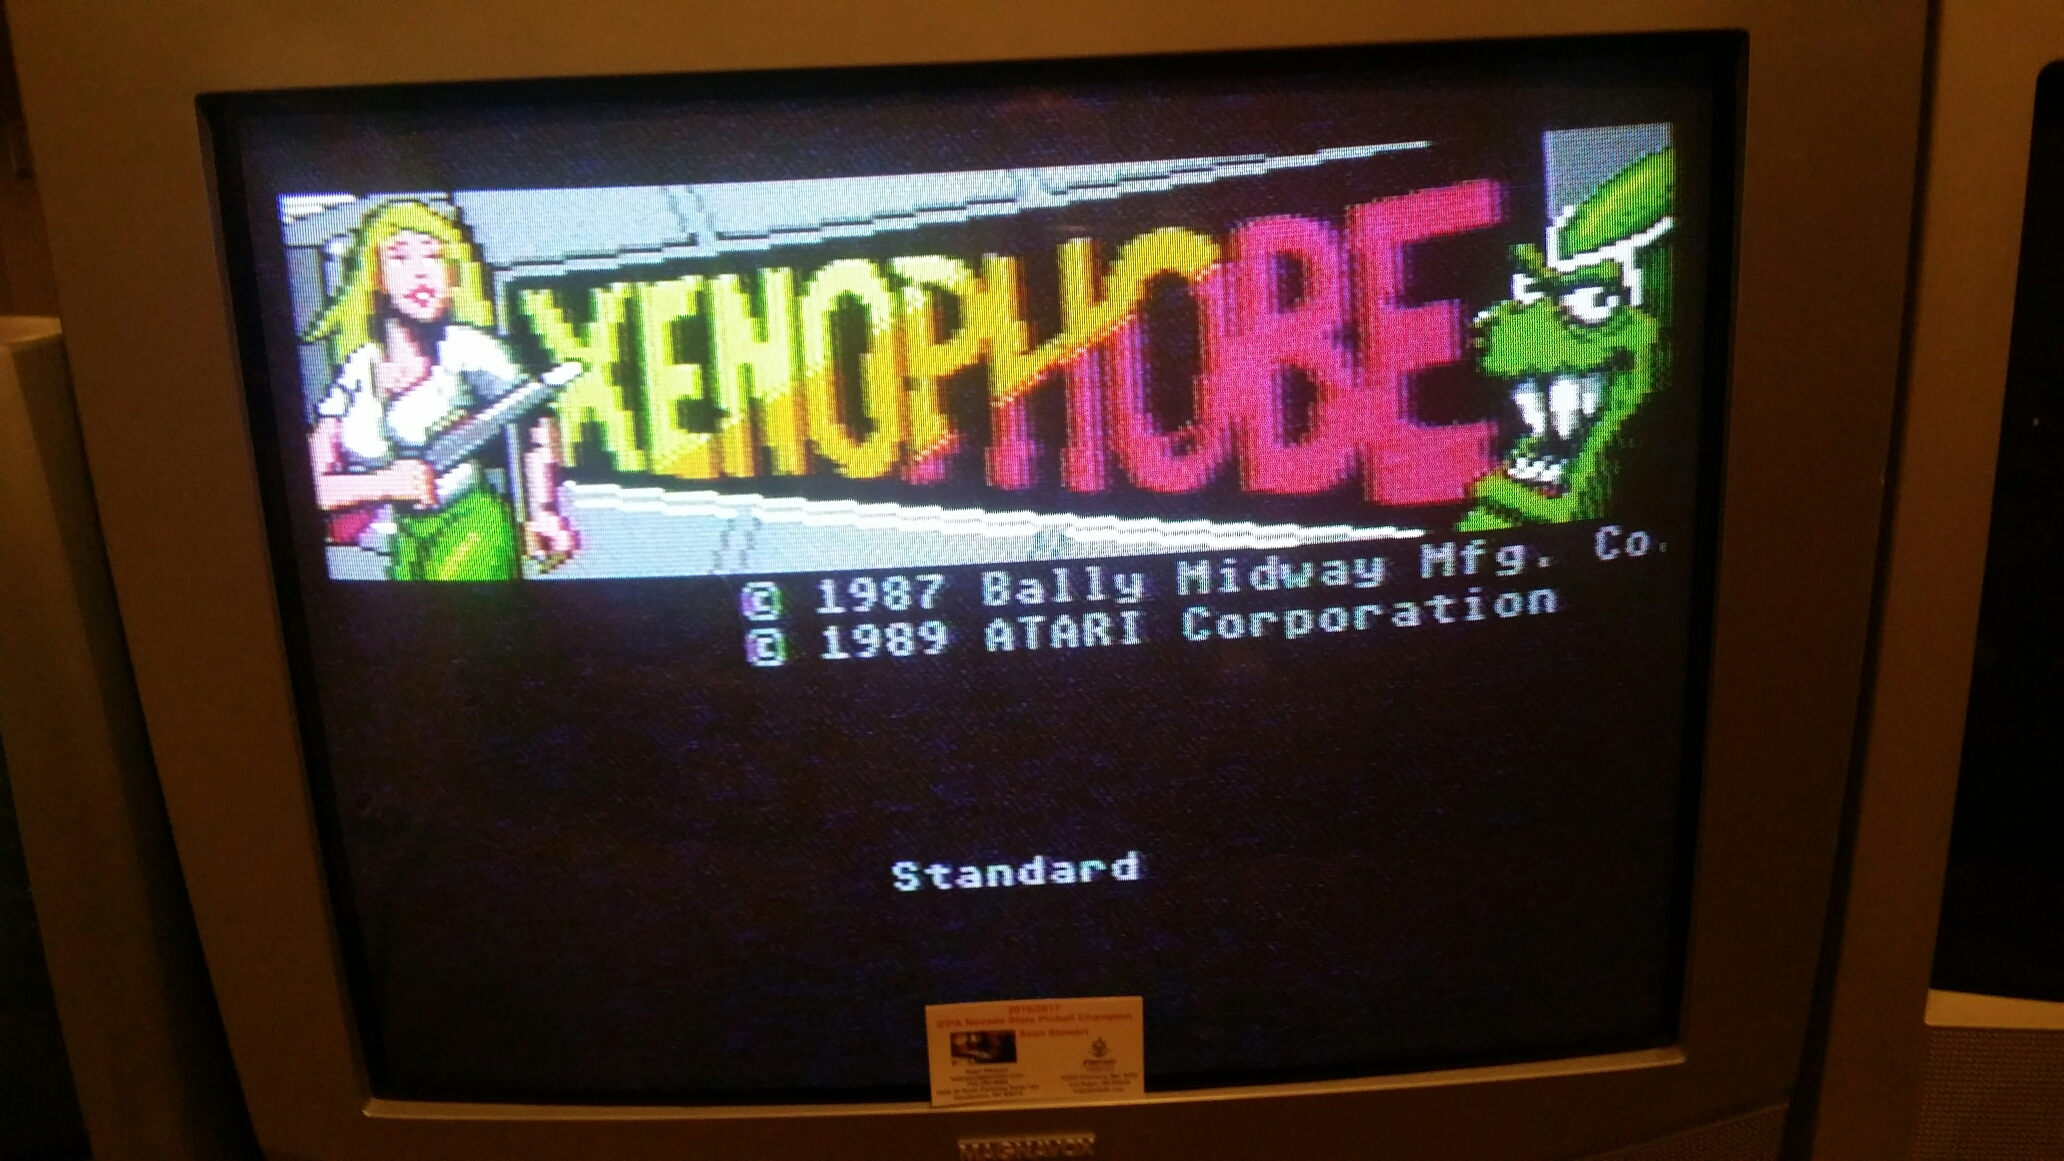 Xenophobe: Standard 79,235 points